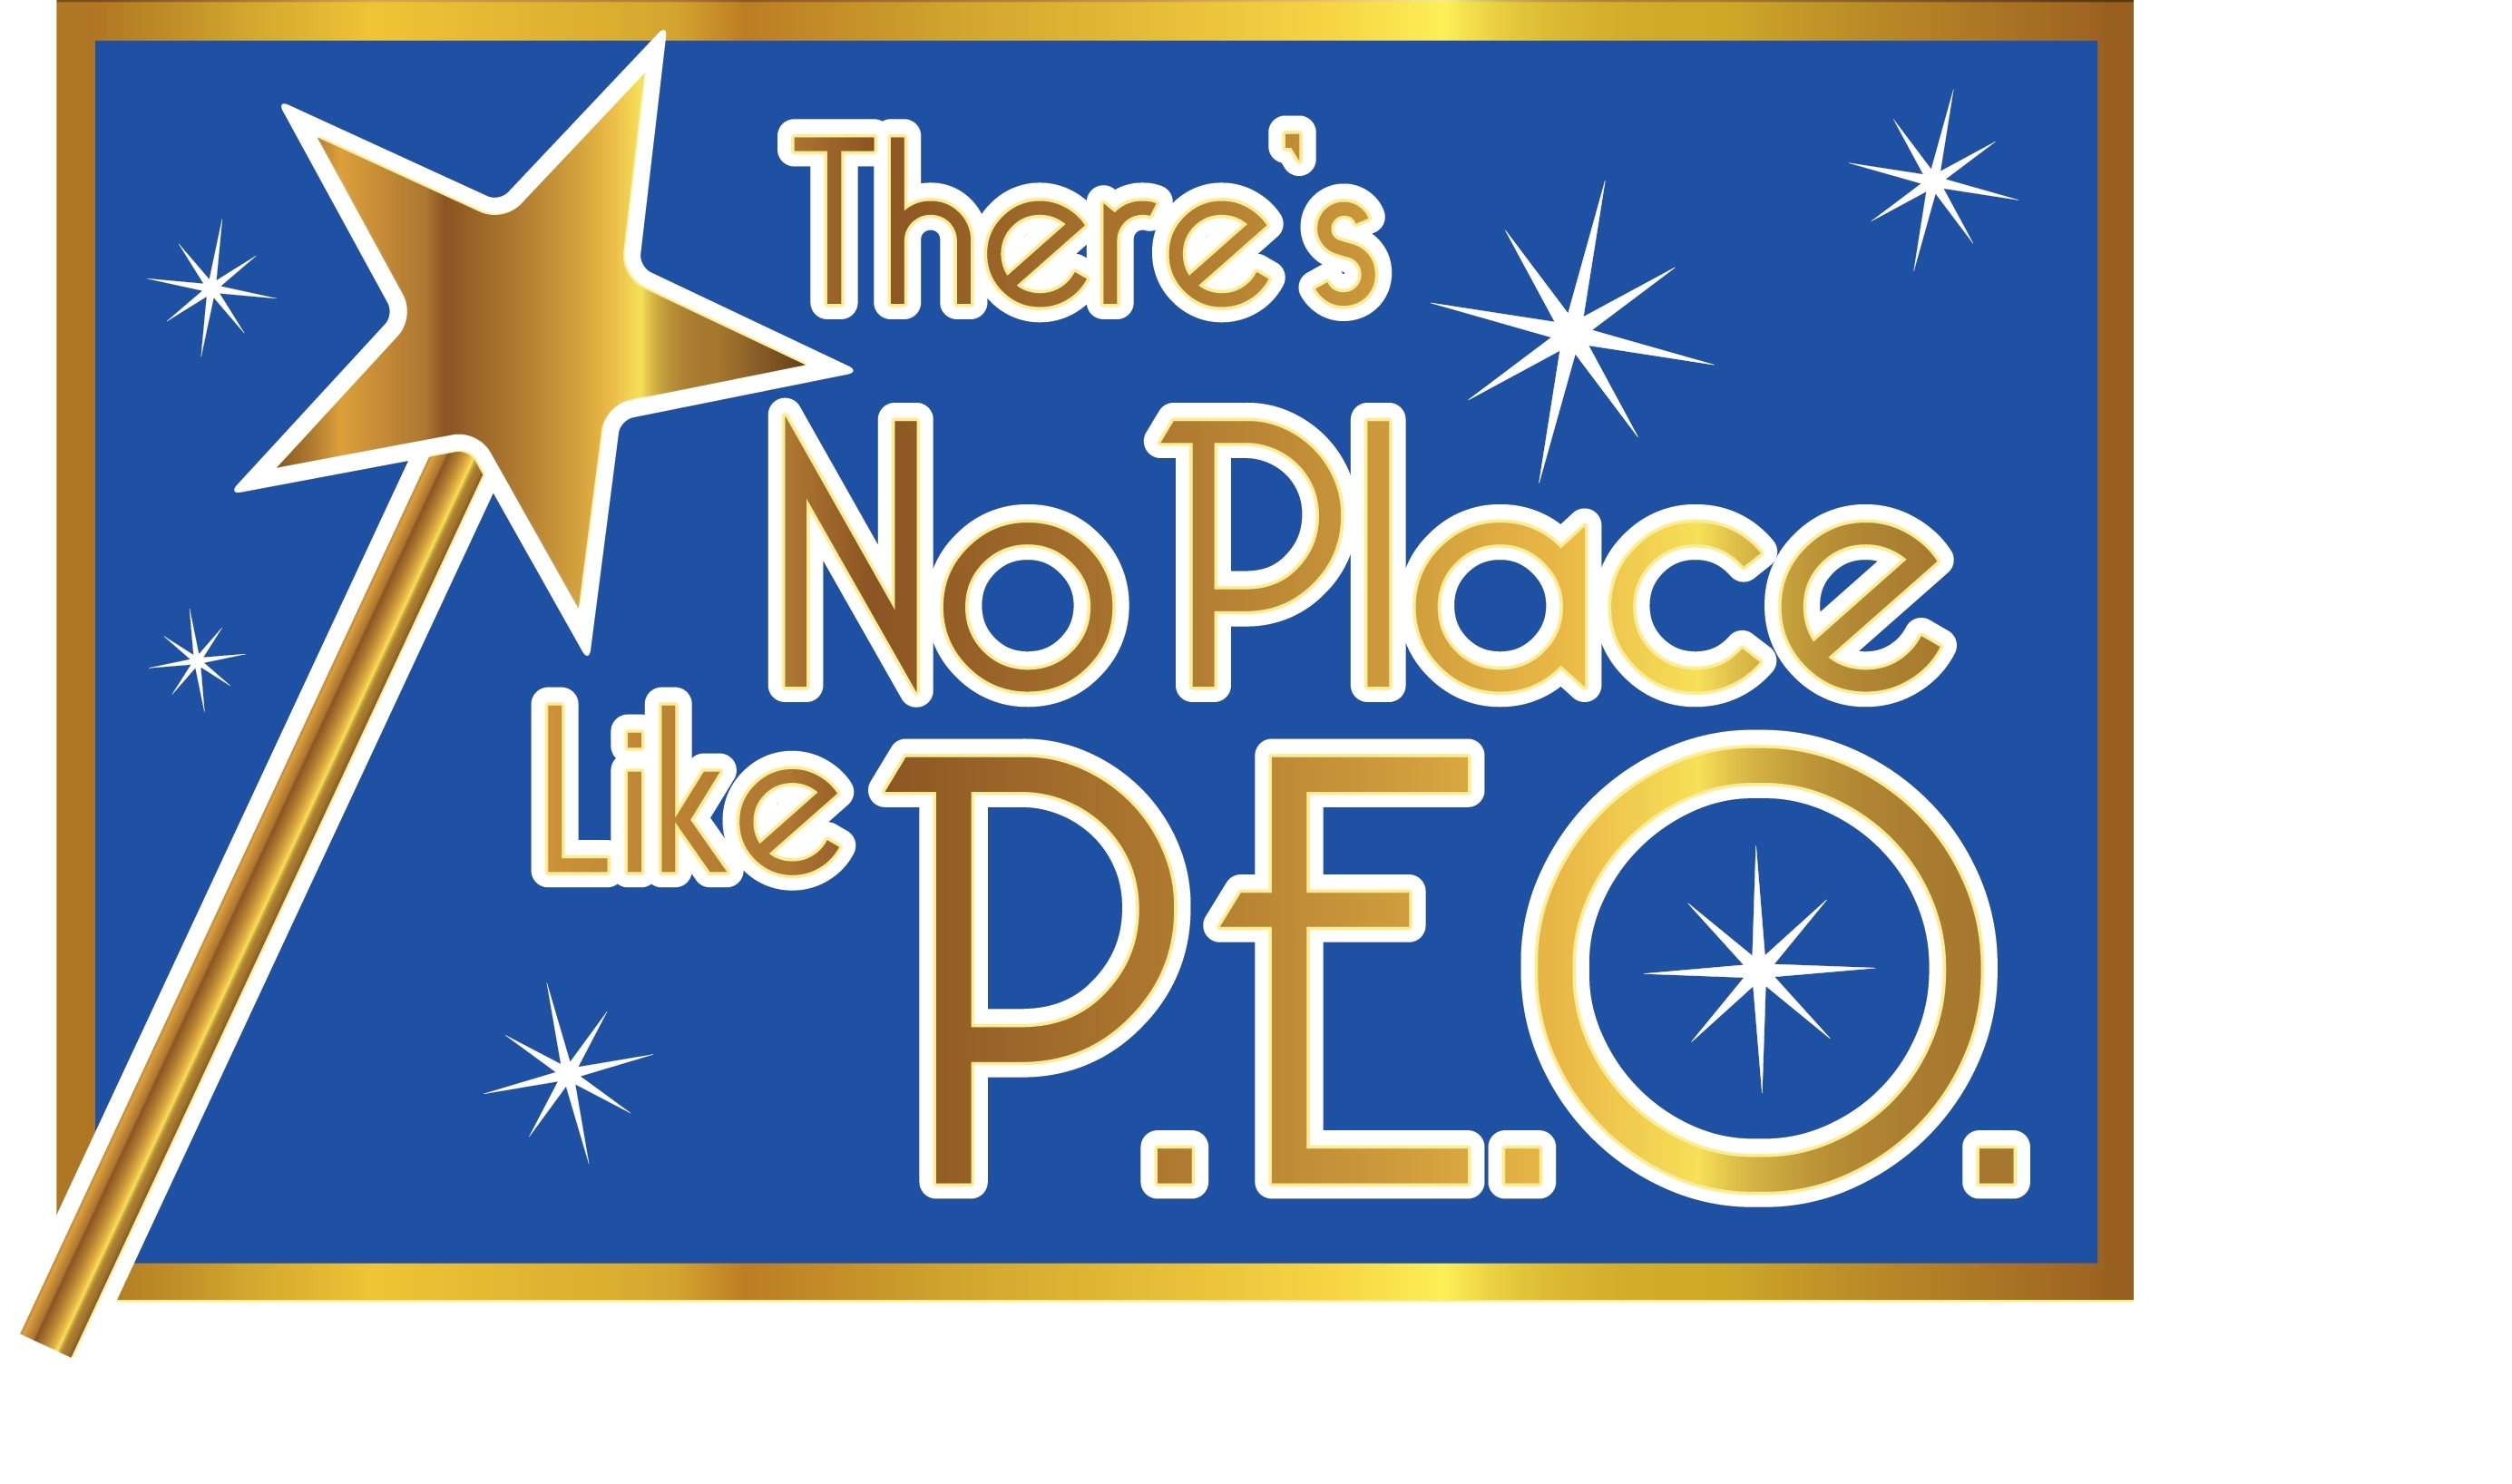 There's No Place Like P.E.O.